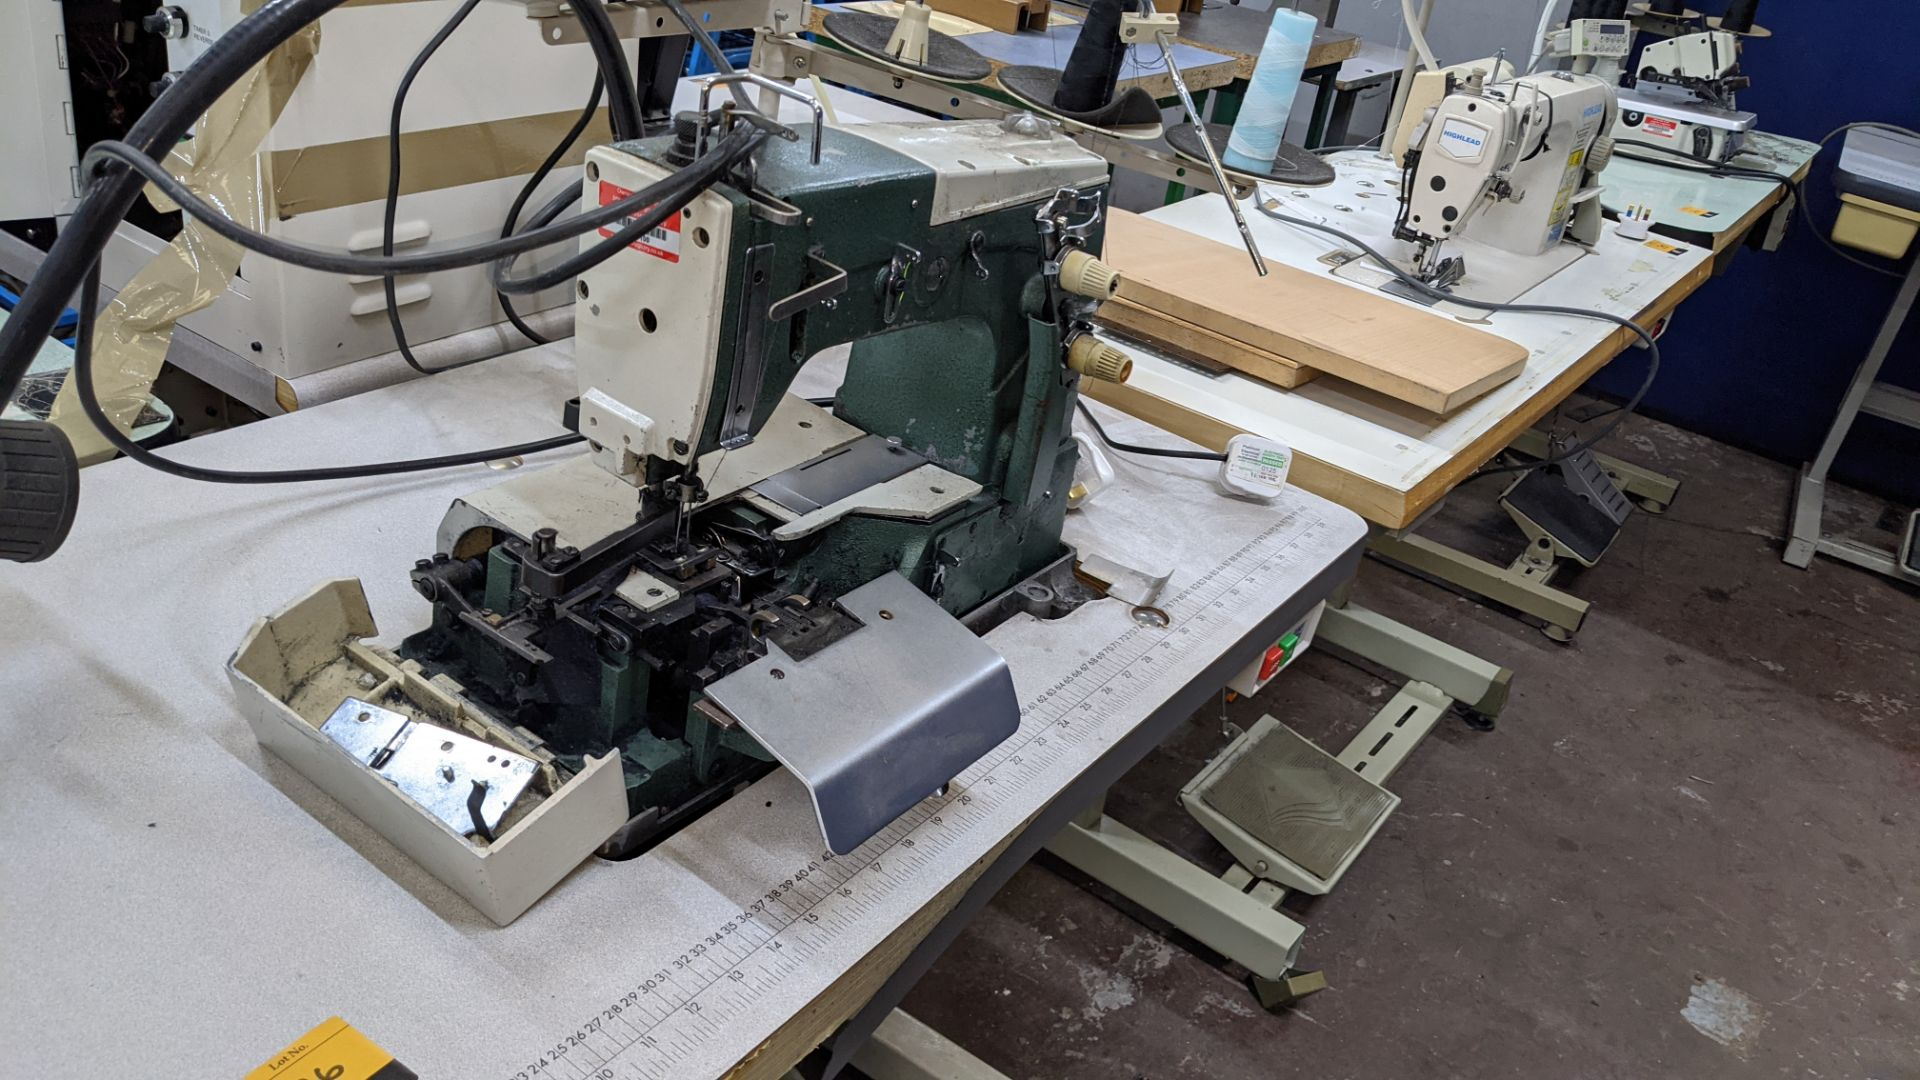 Sewing machine - Image 6 of 16